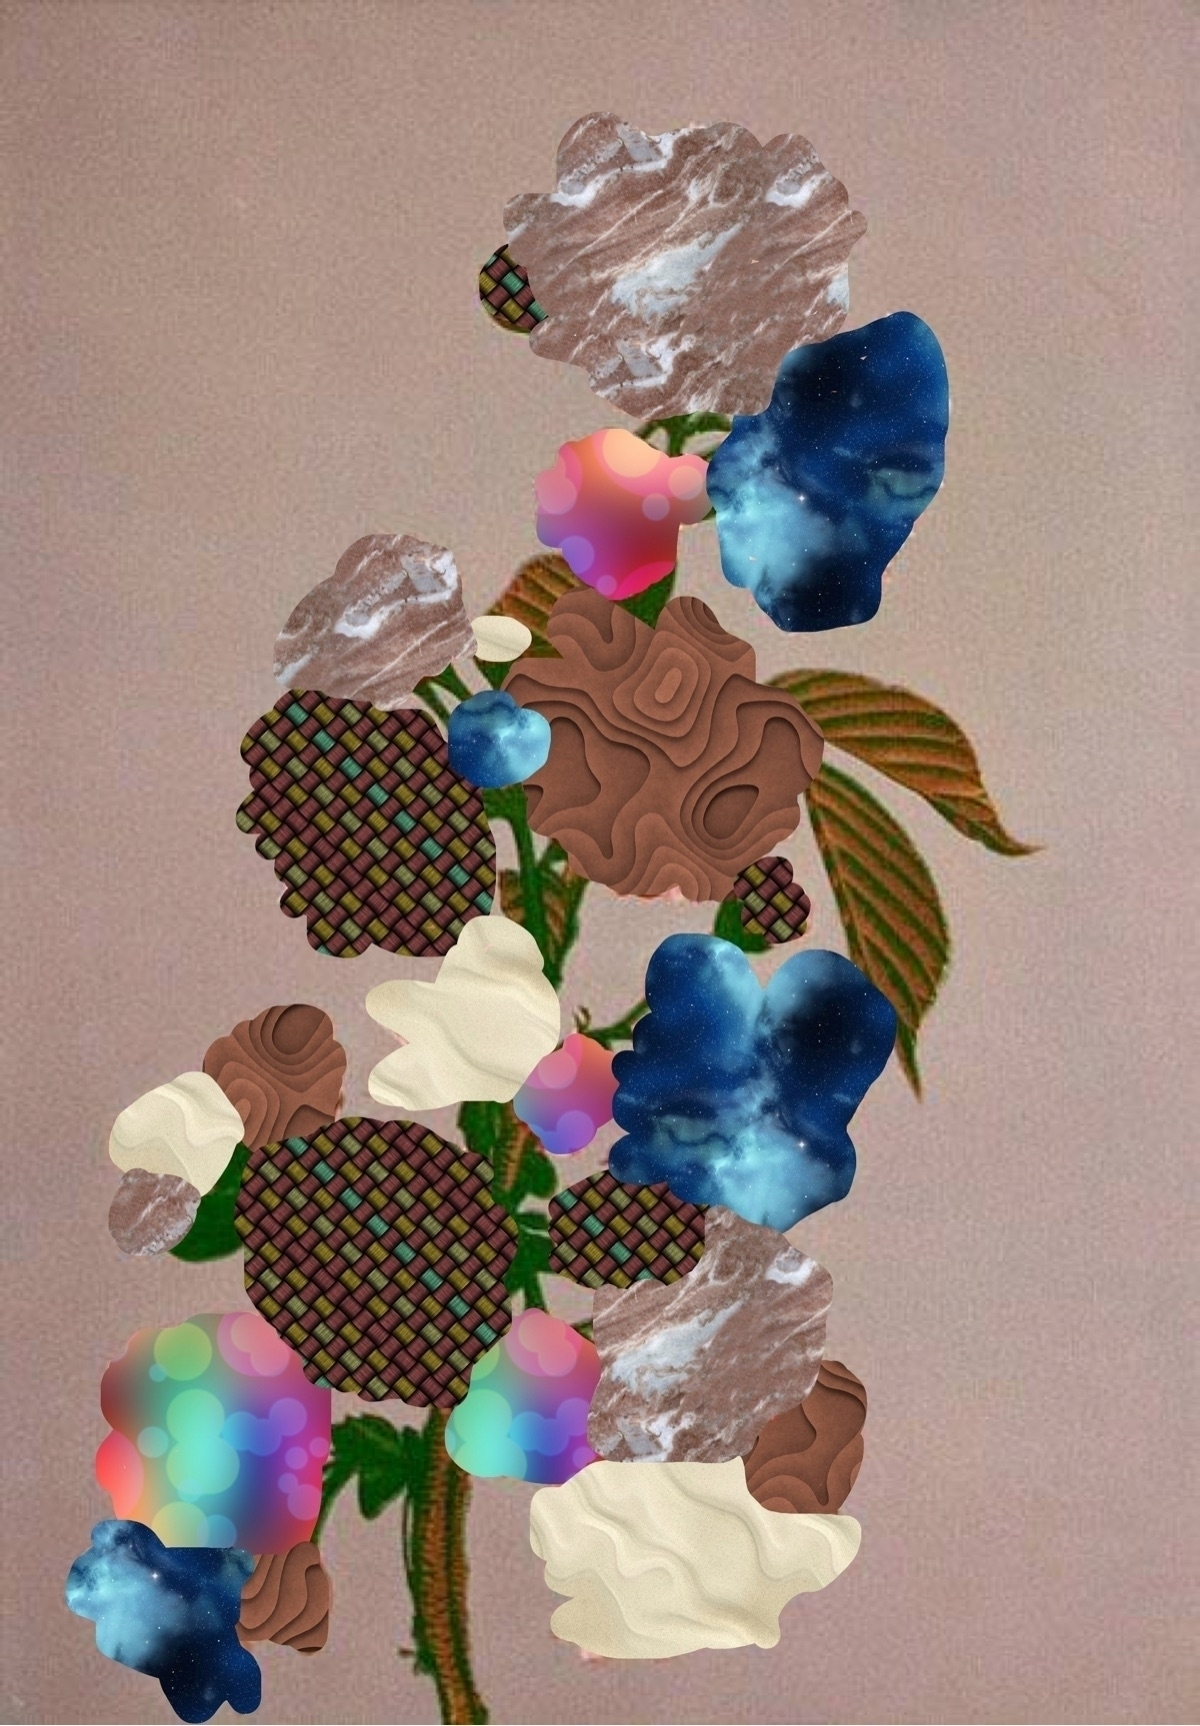 Flowers JulienMartin - julienmartin | ello